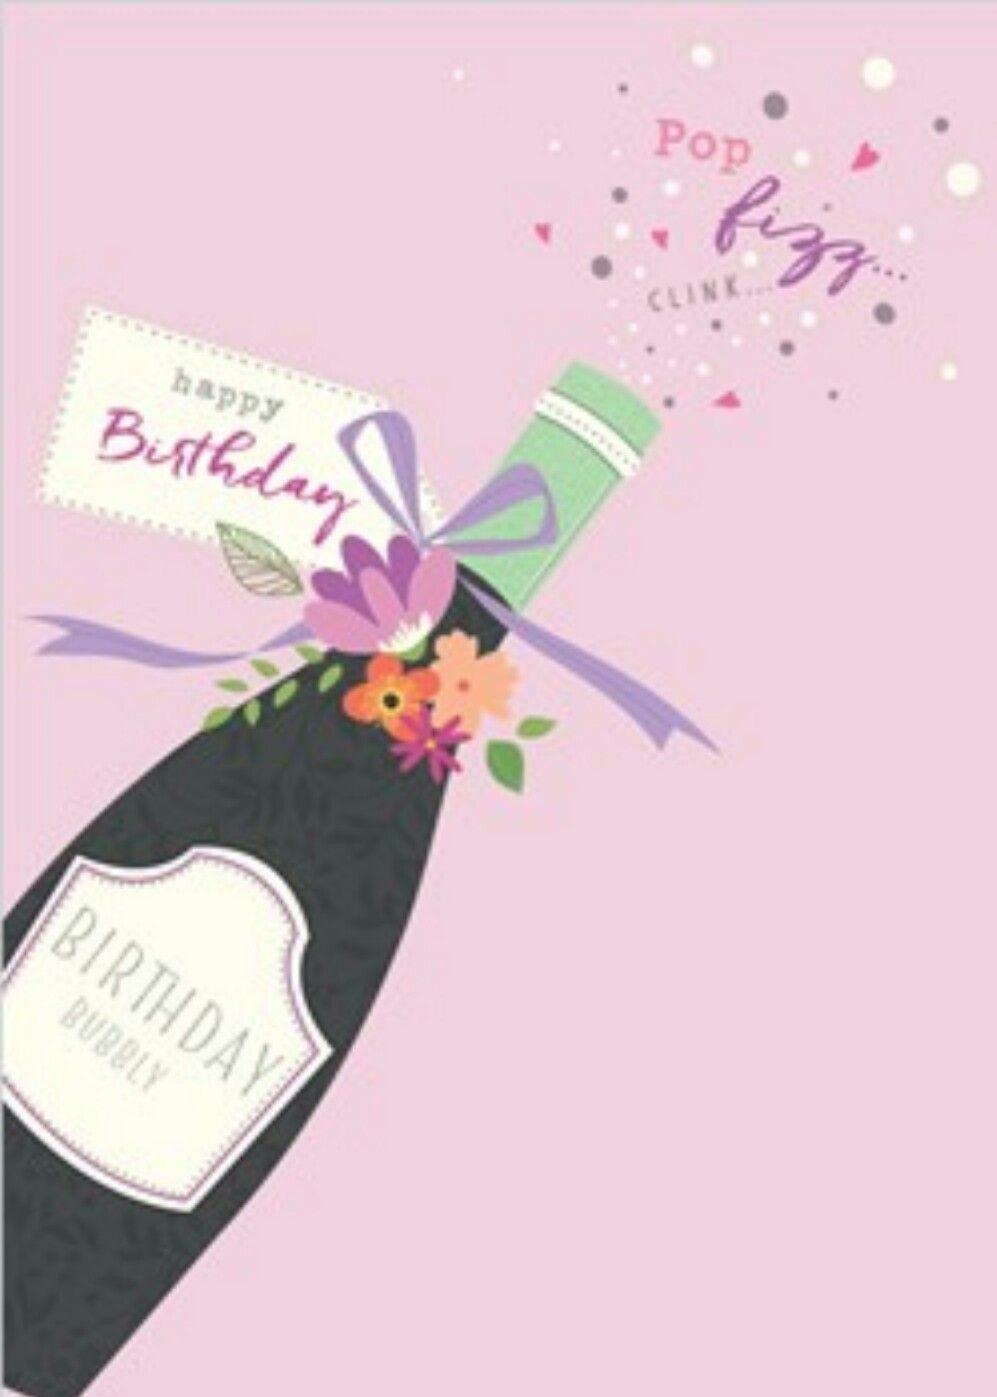 Pin By Gemma Escalera On Quotes Pinterest Birthdays Happy